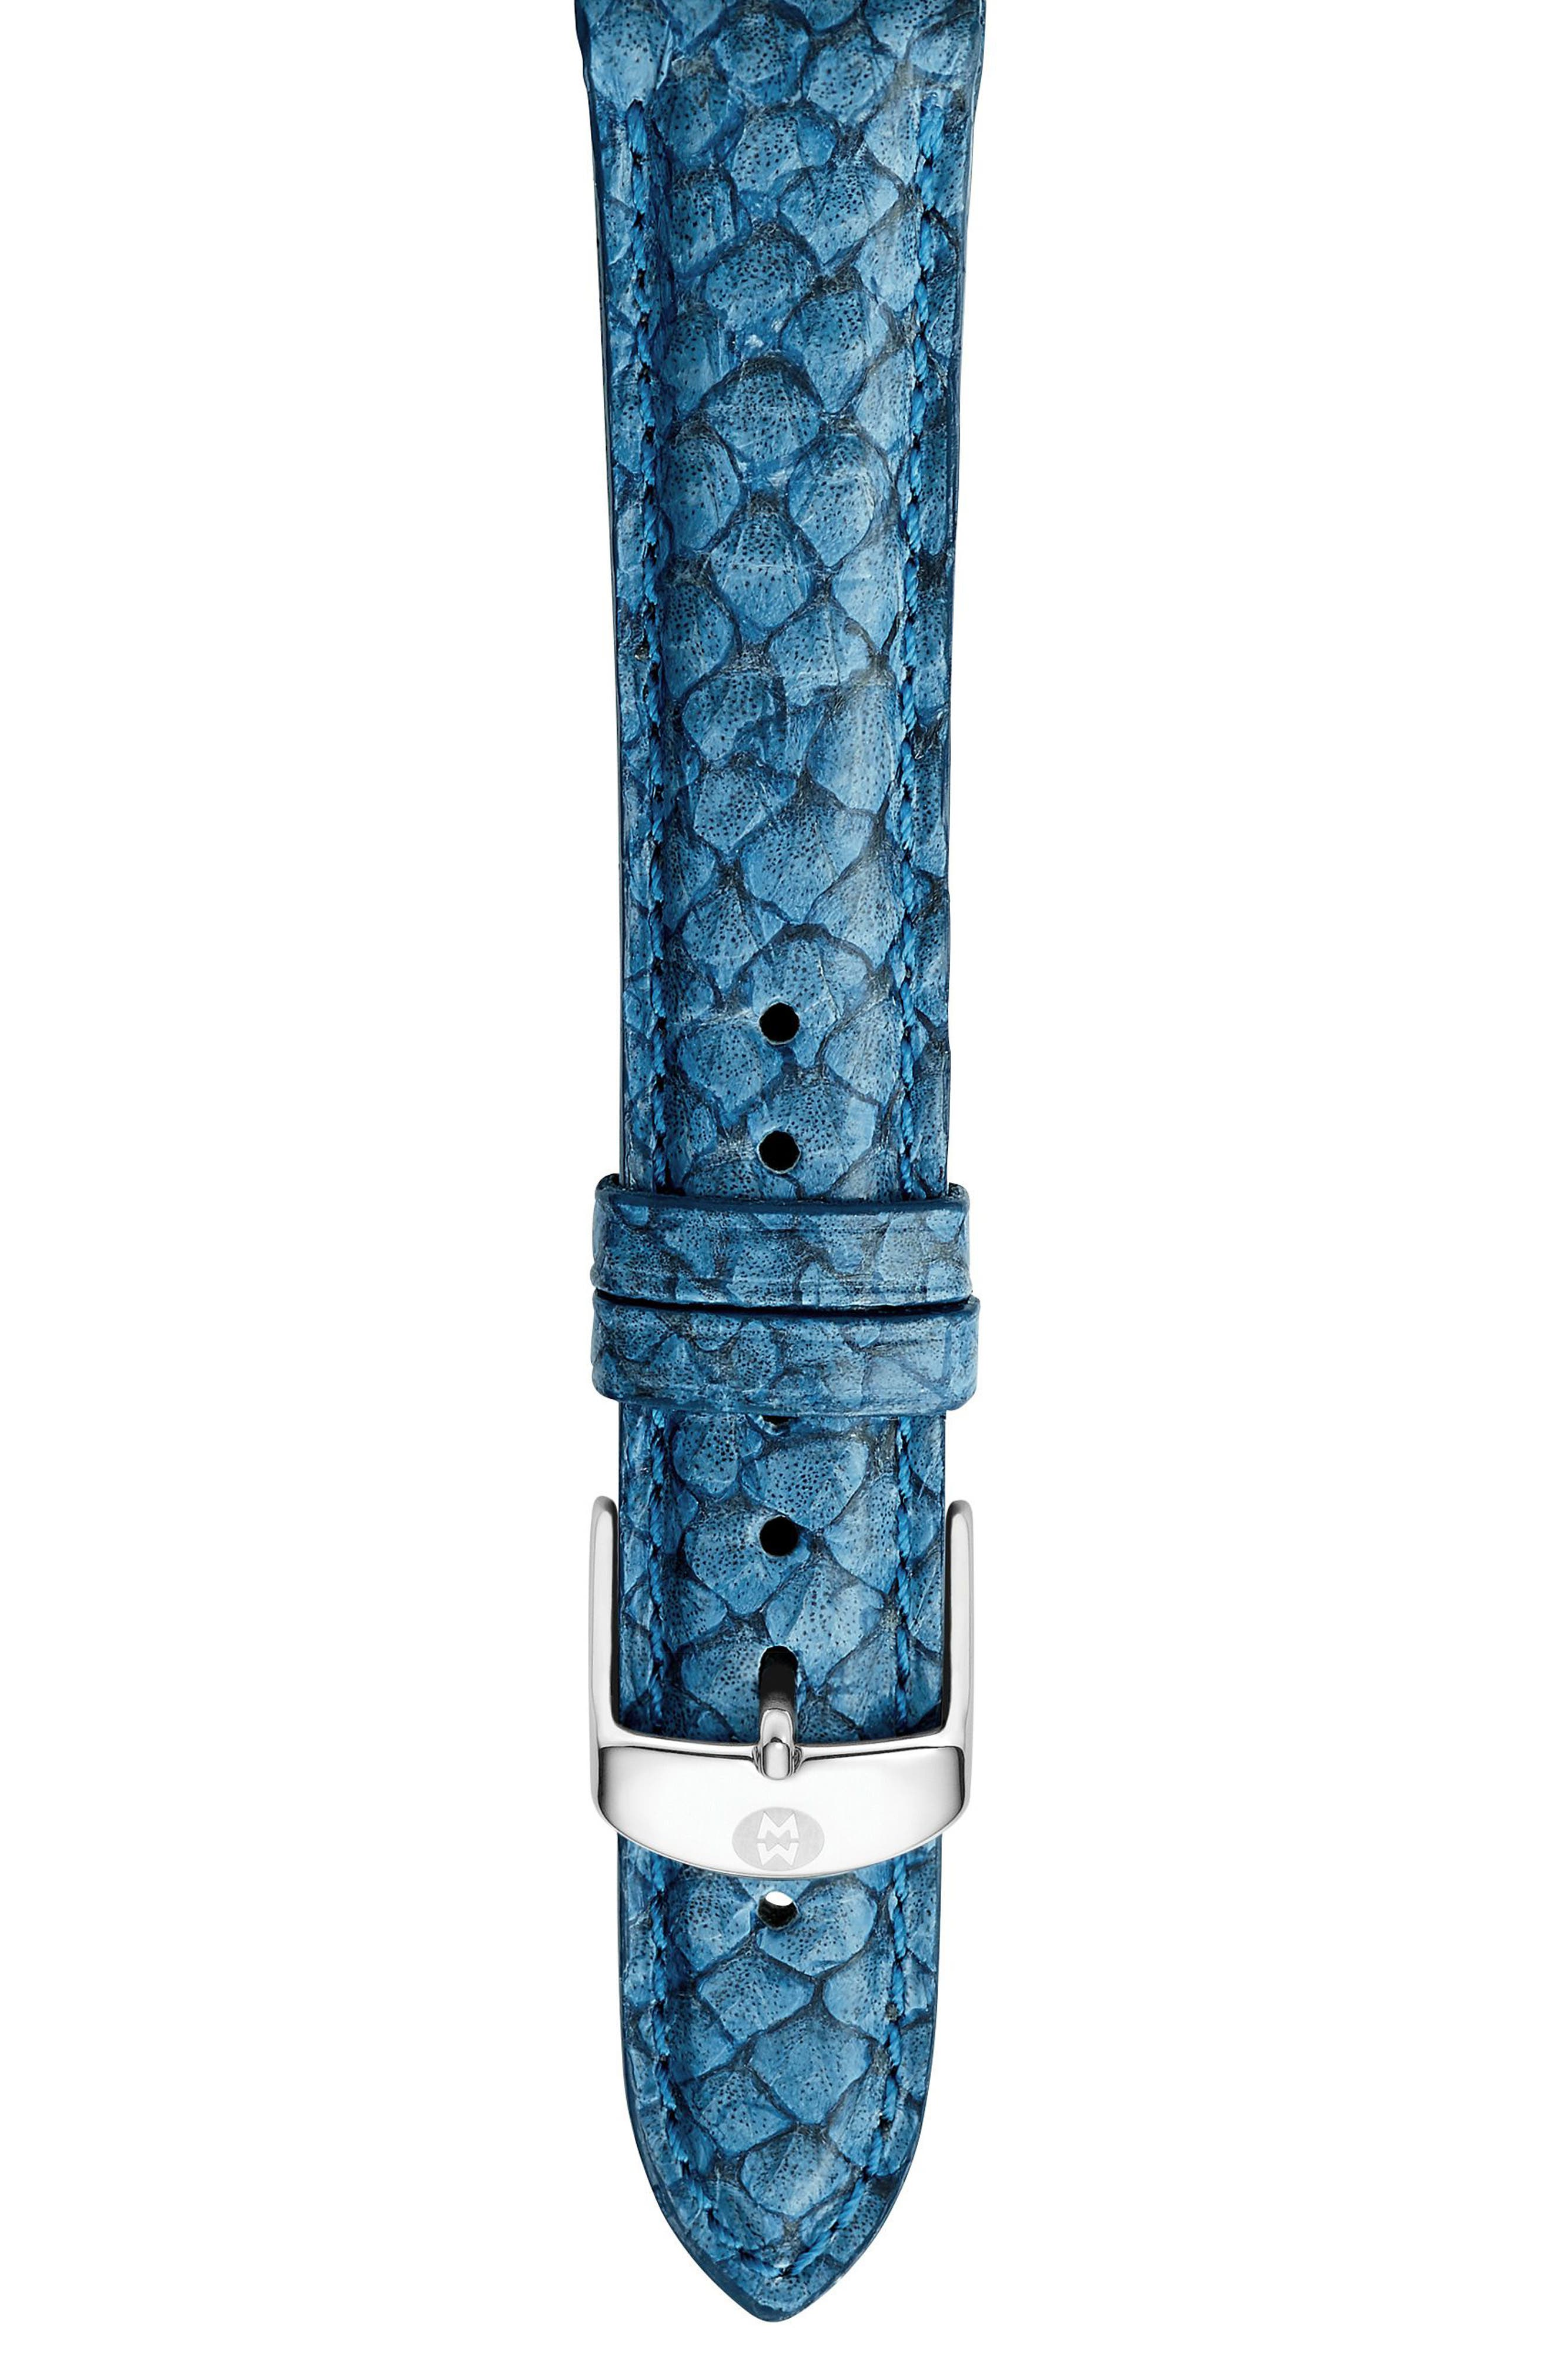 Main Image - MICHELE 18mm Seamist Blue Fish Skin Watch Strap